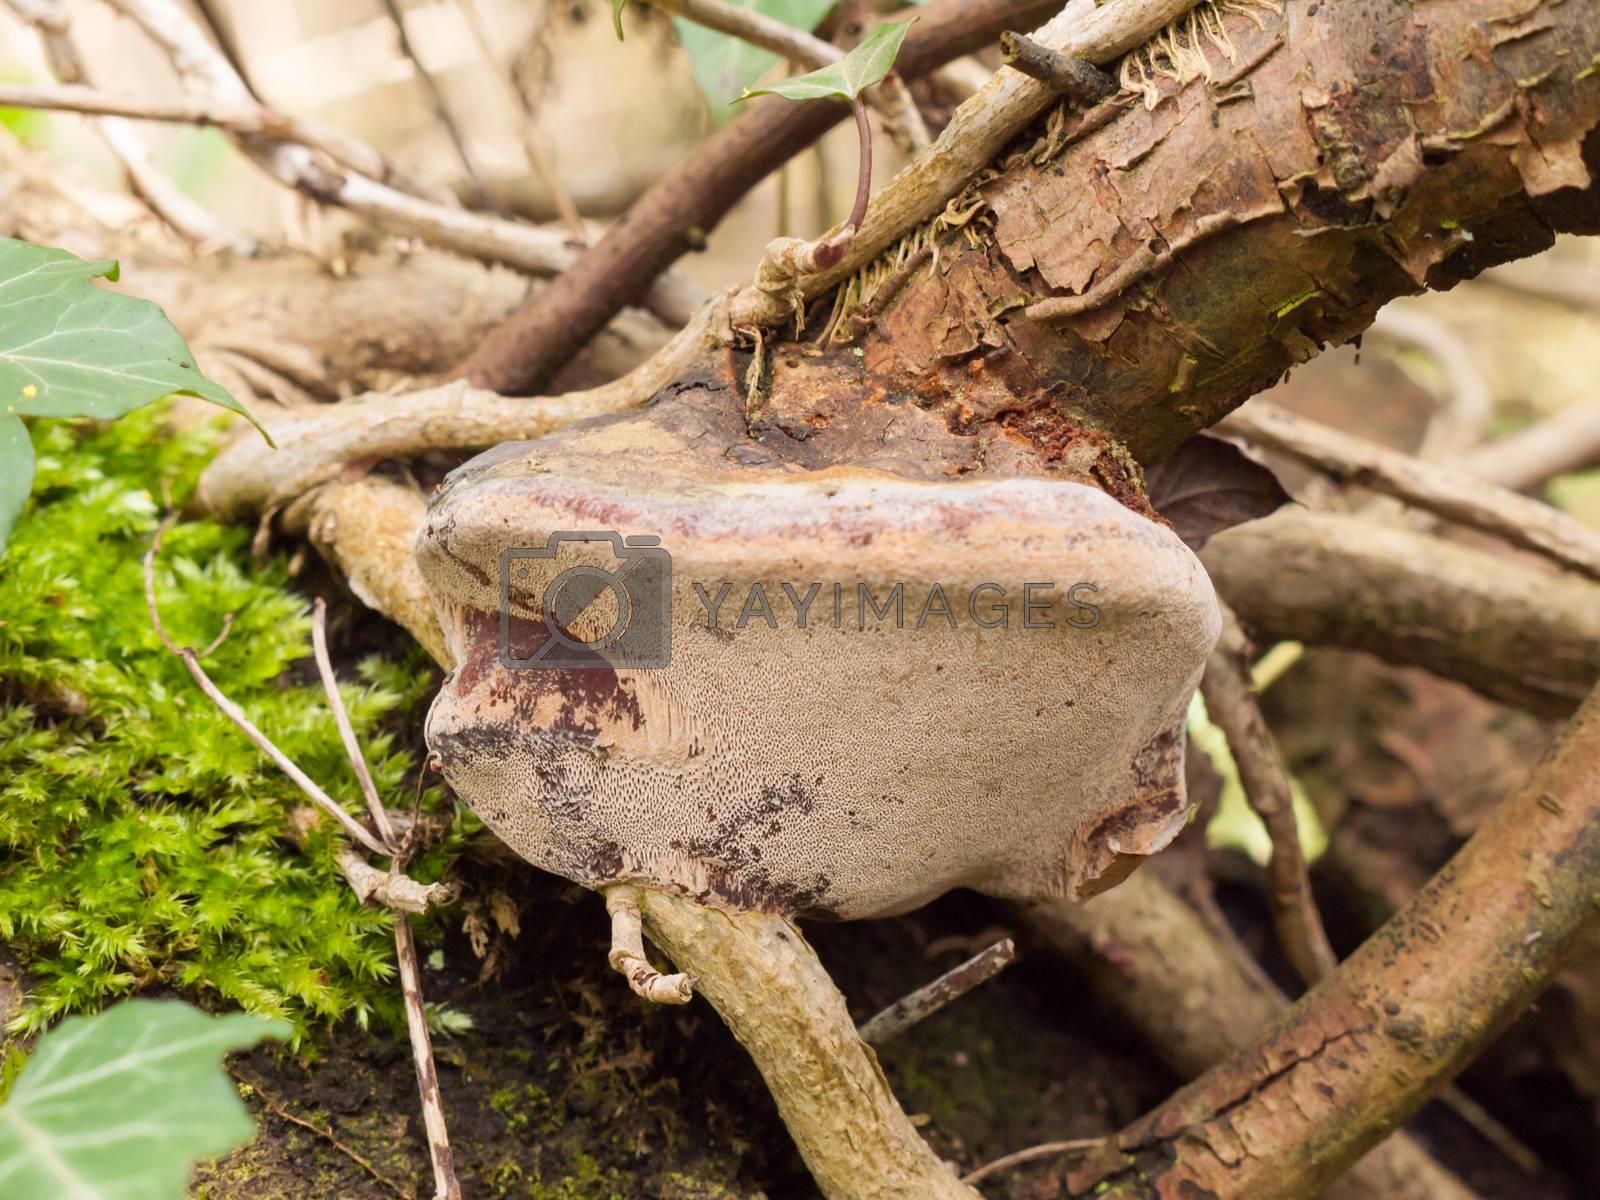 close up bracket mushroom on wood stick branch fungi details; essex; england; uk